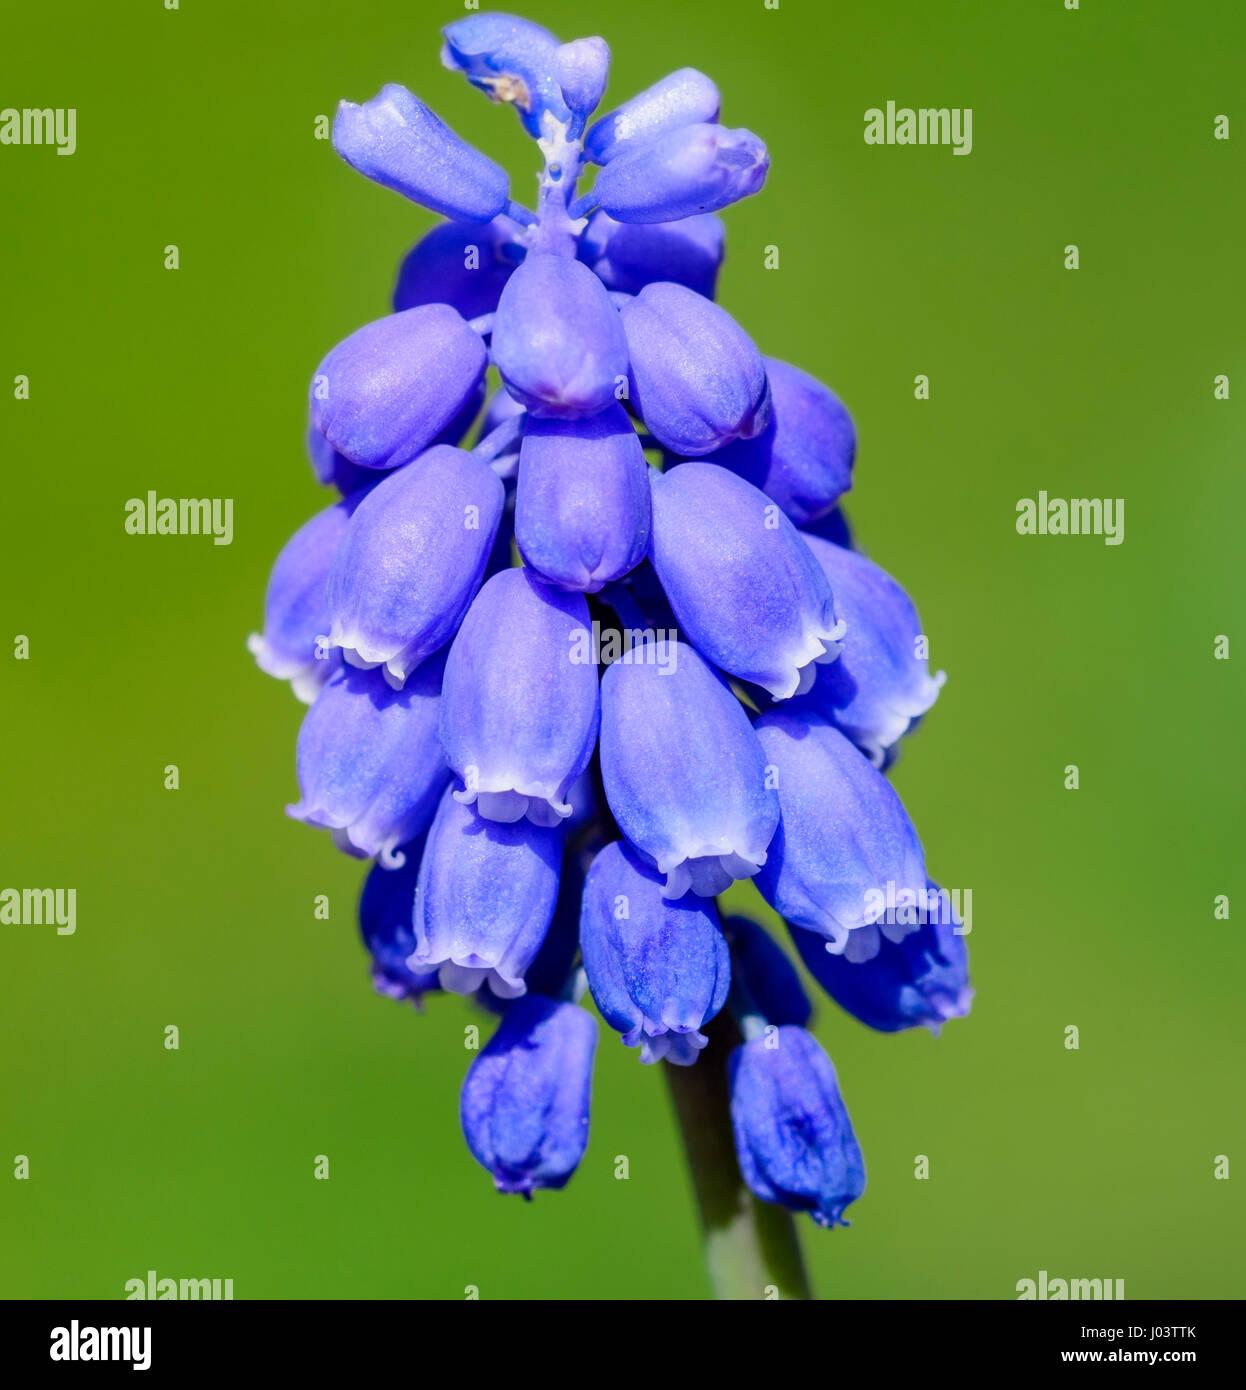 Giacinto d'uva. Close up di un armeno giacinto di uva (Muscari armeniacum) impianto nel West Sussex, in Inghilterra, Immagini Stock